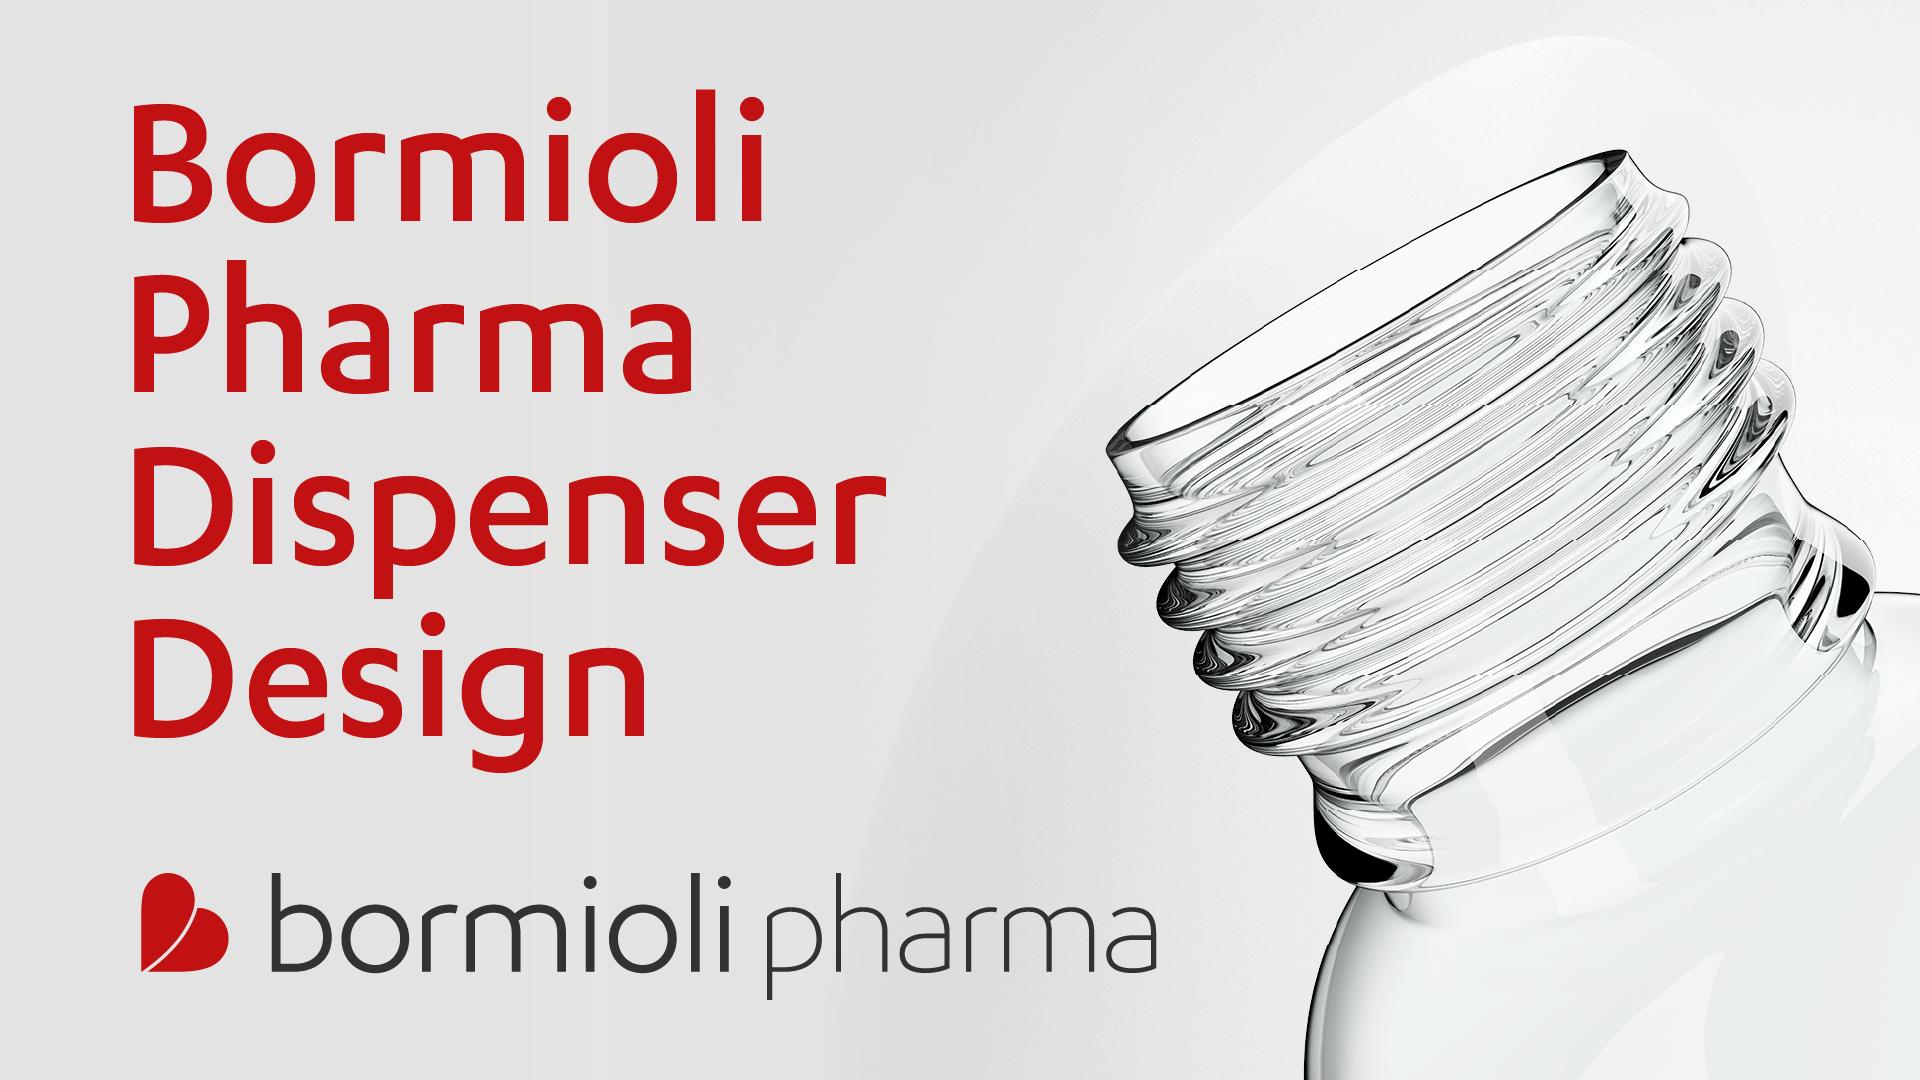 Bormioli Pharma Disxpenser Design